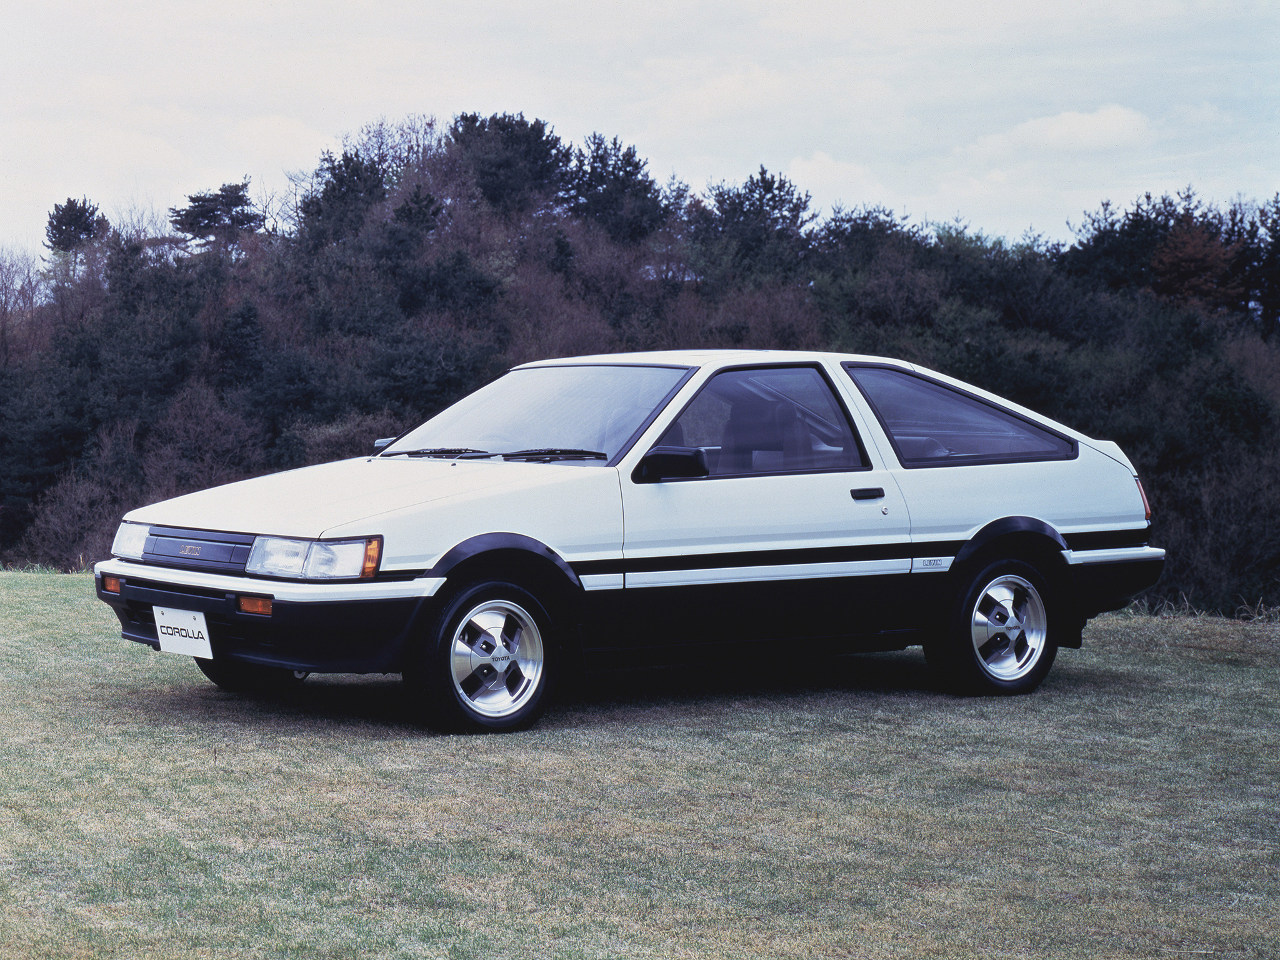 [Image: Toyota%2BCorolla%2BLevin%2BGT-Apex%2B83%...p%2529.jpg]